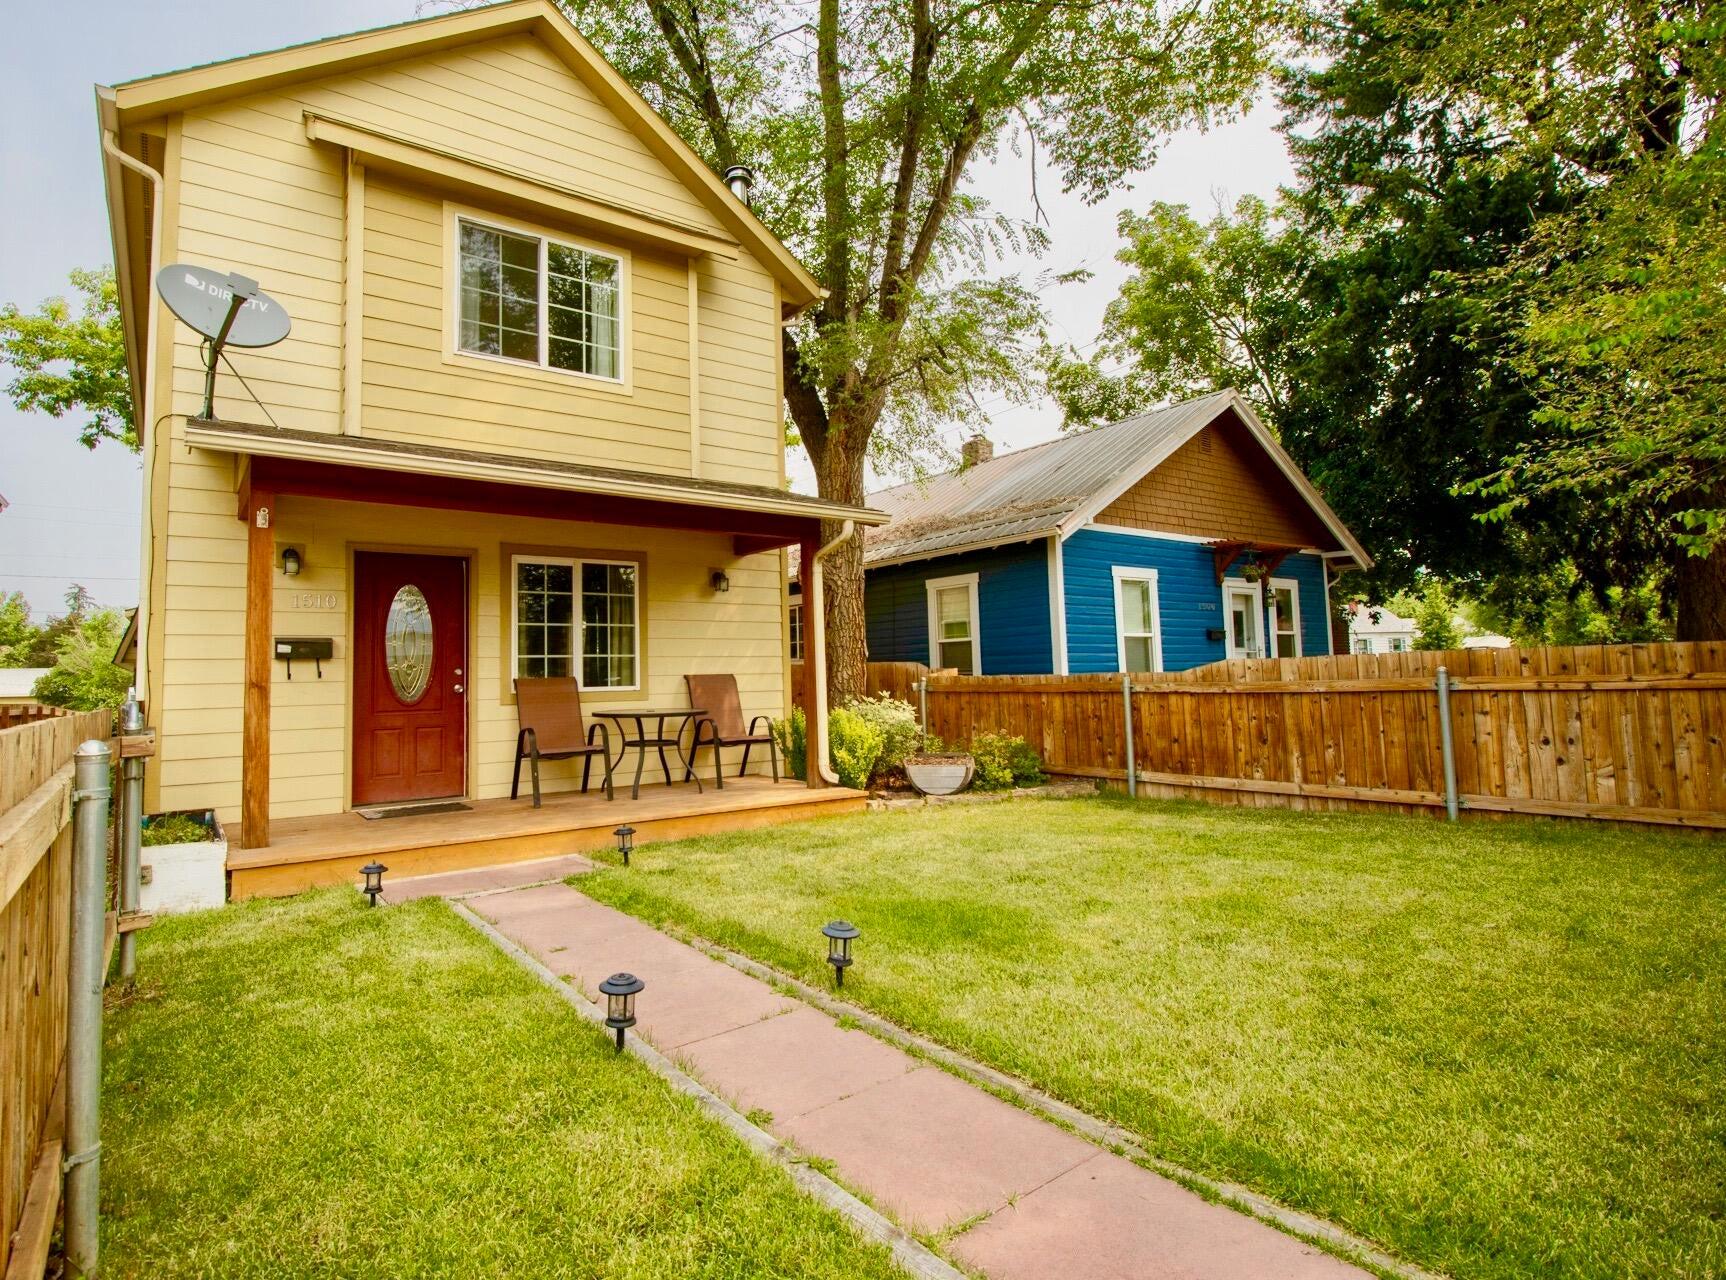 1510 South 8th Street West, Missoula, MT 59801